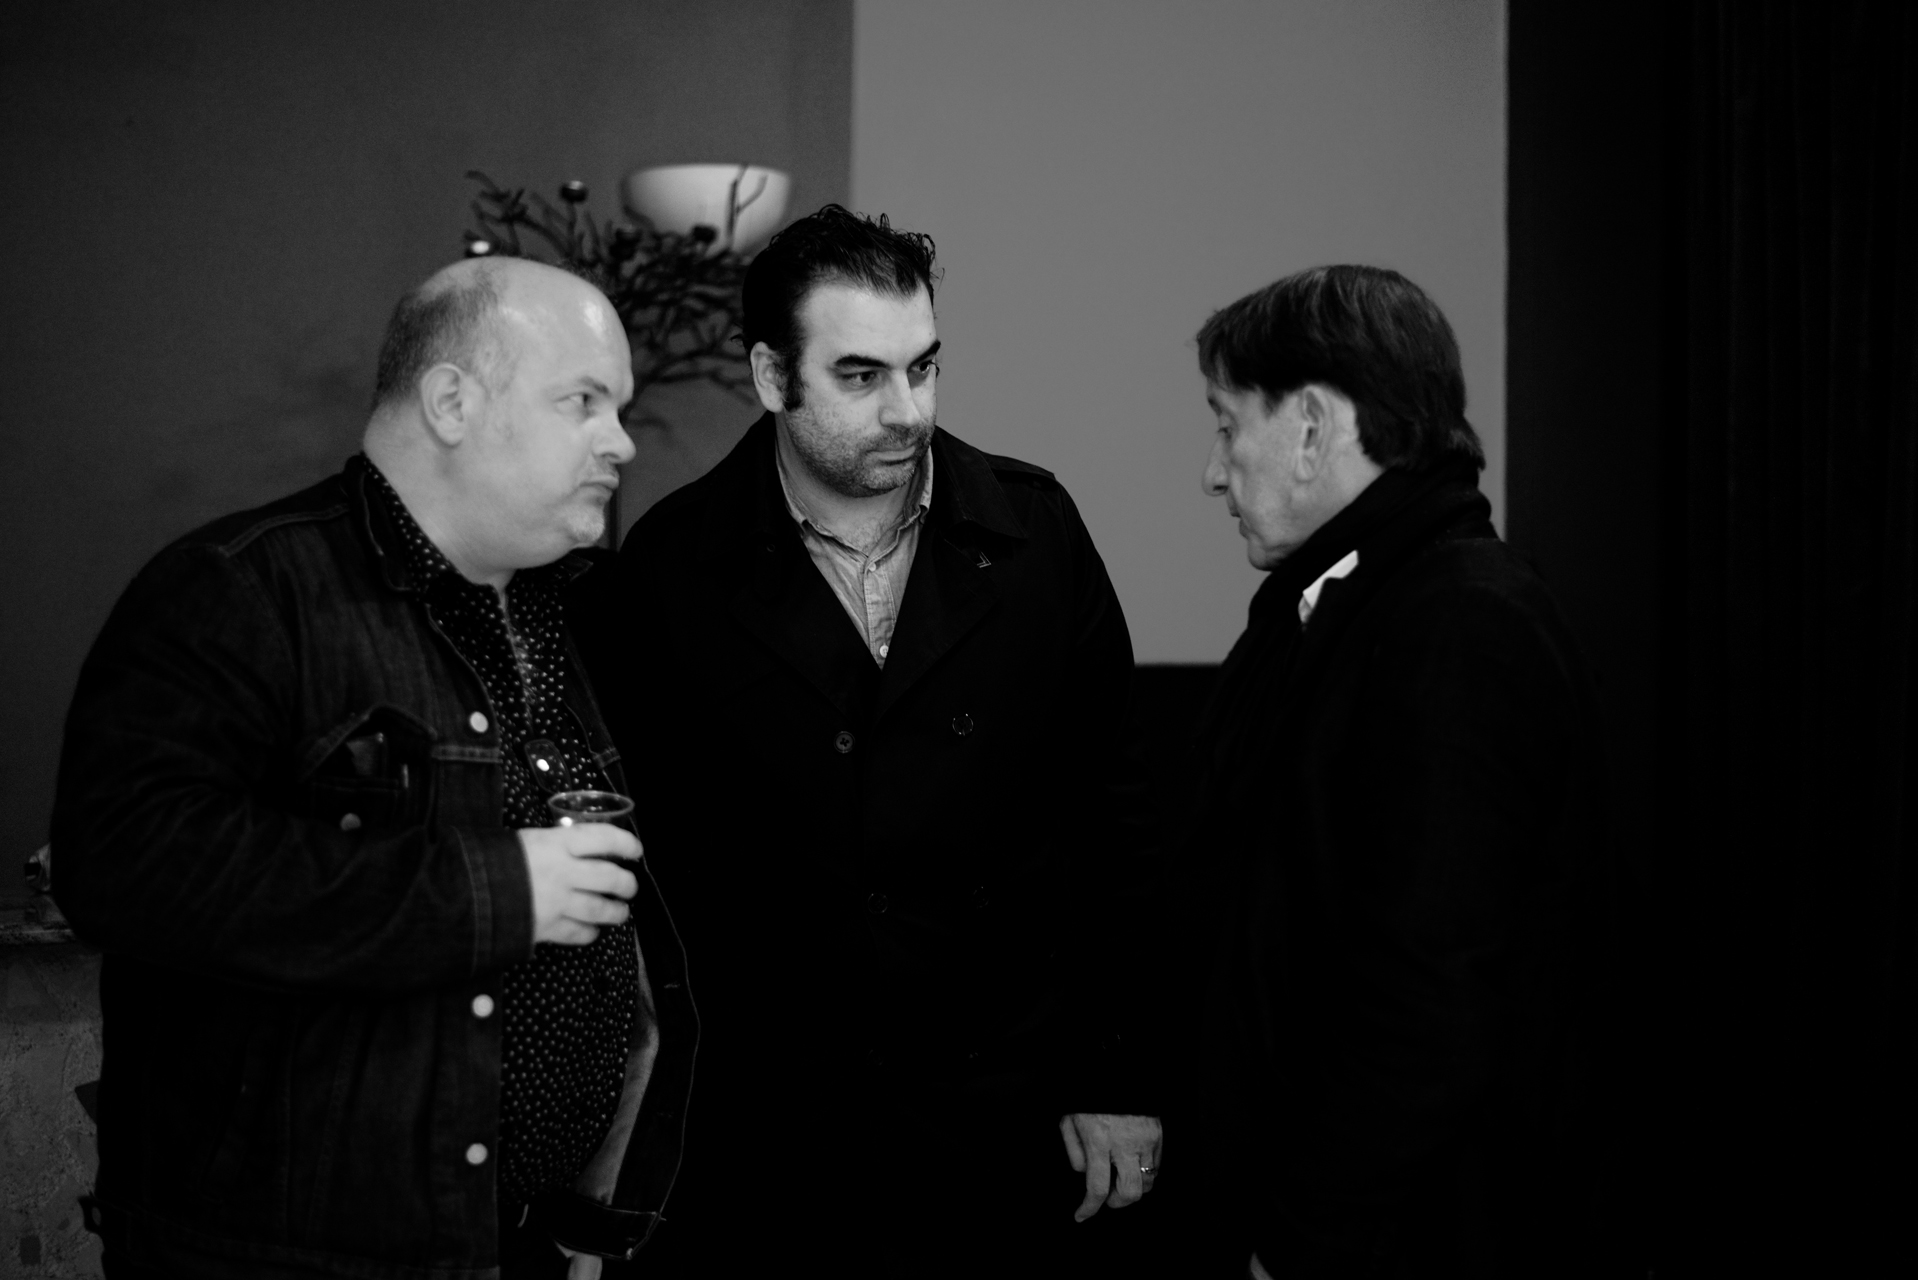 Laurent Nel, J.Leleu & G. Sibelle